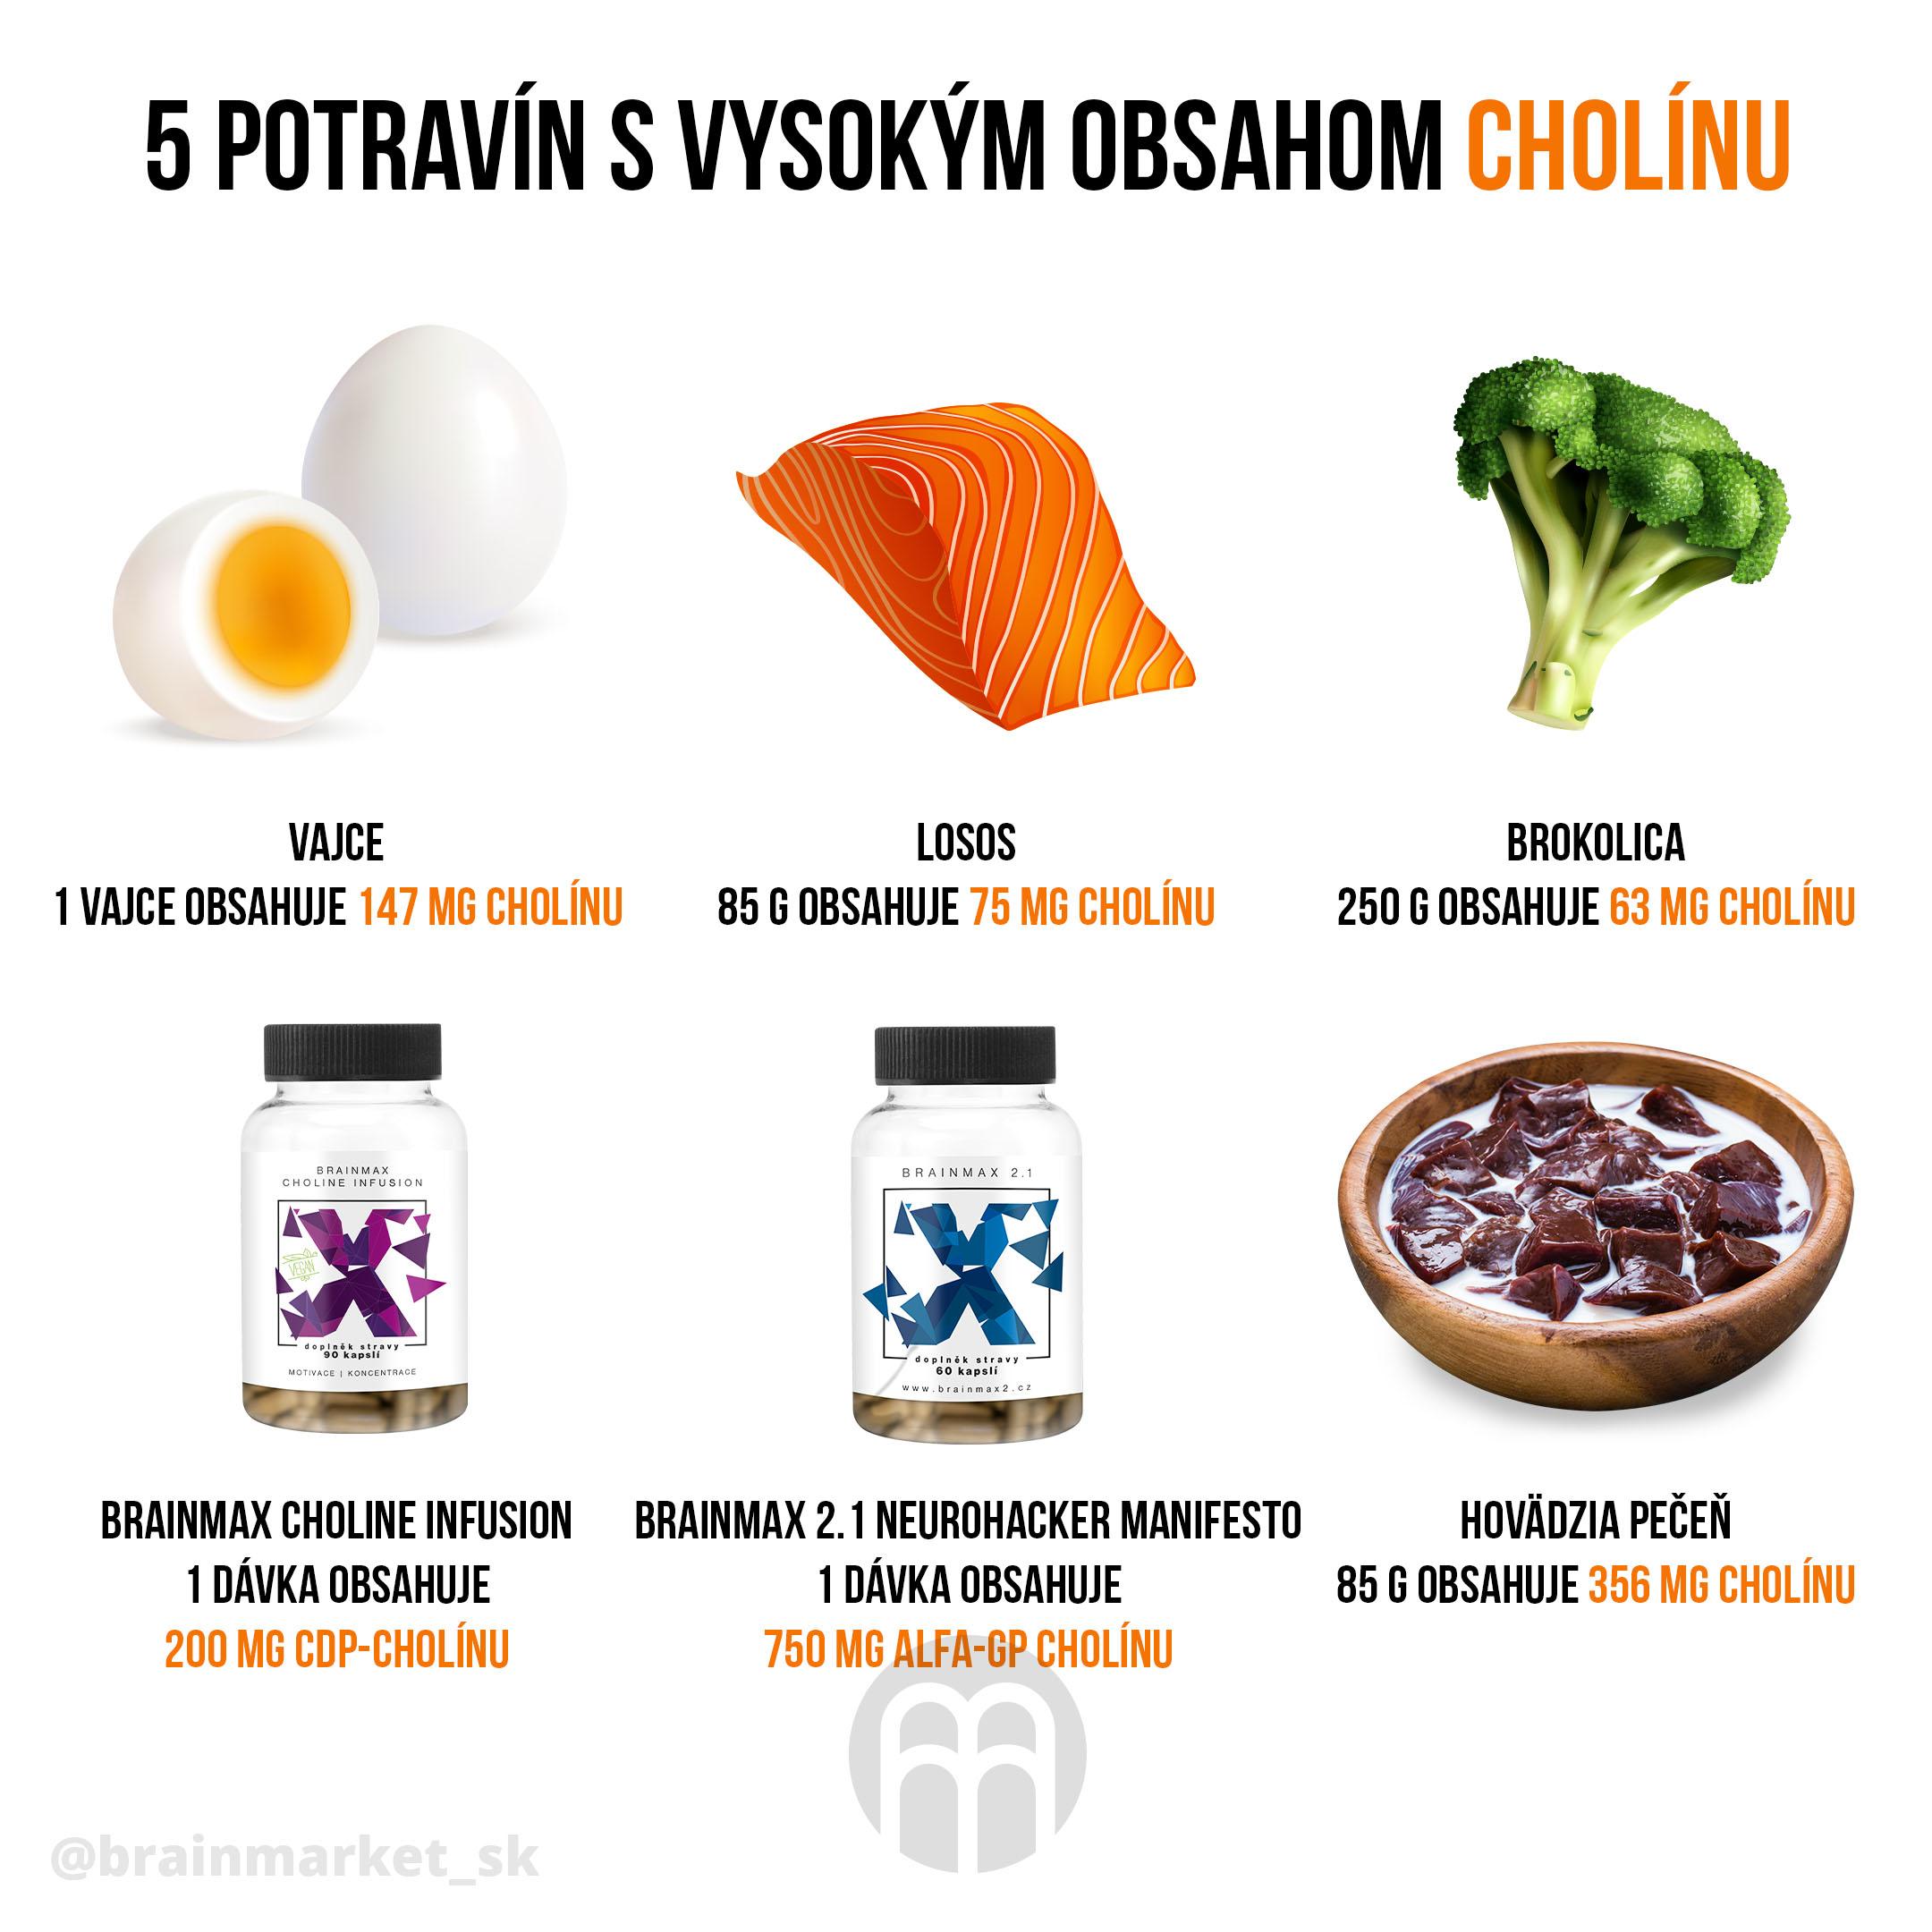 5_potravin_s_vysokym_obsahom_cholinu_update_infografika_sk